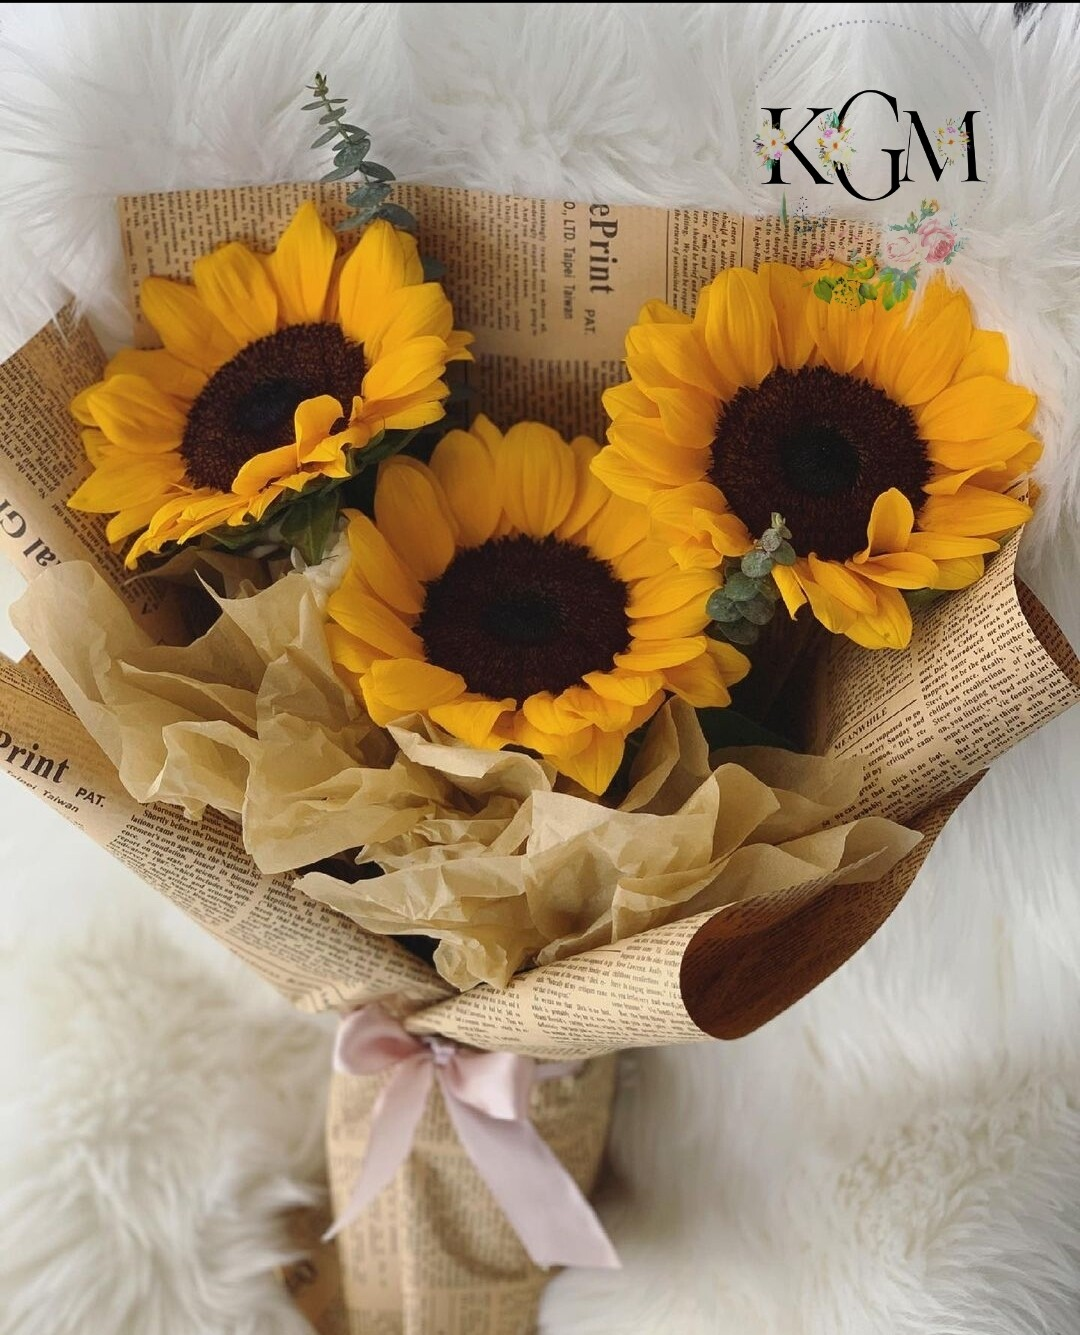 Sunflower Bouquet (By: Keshwini Florist from KL